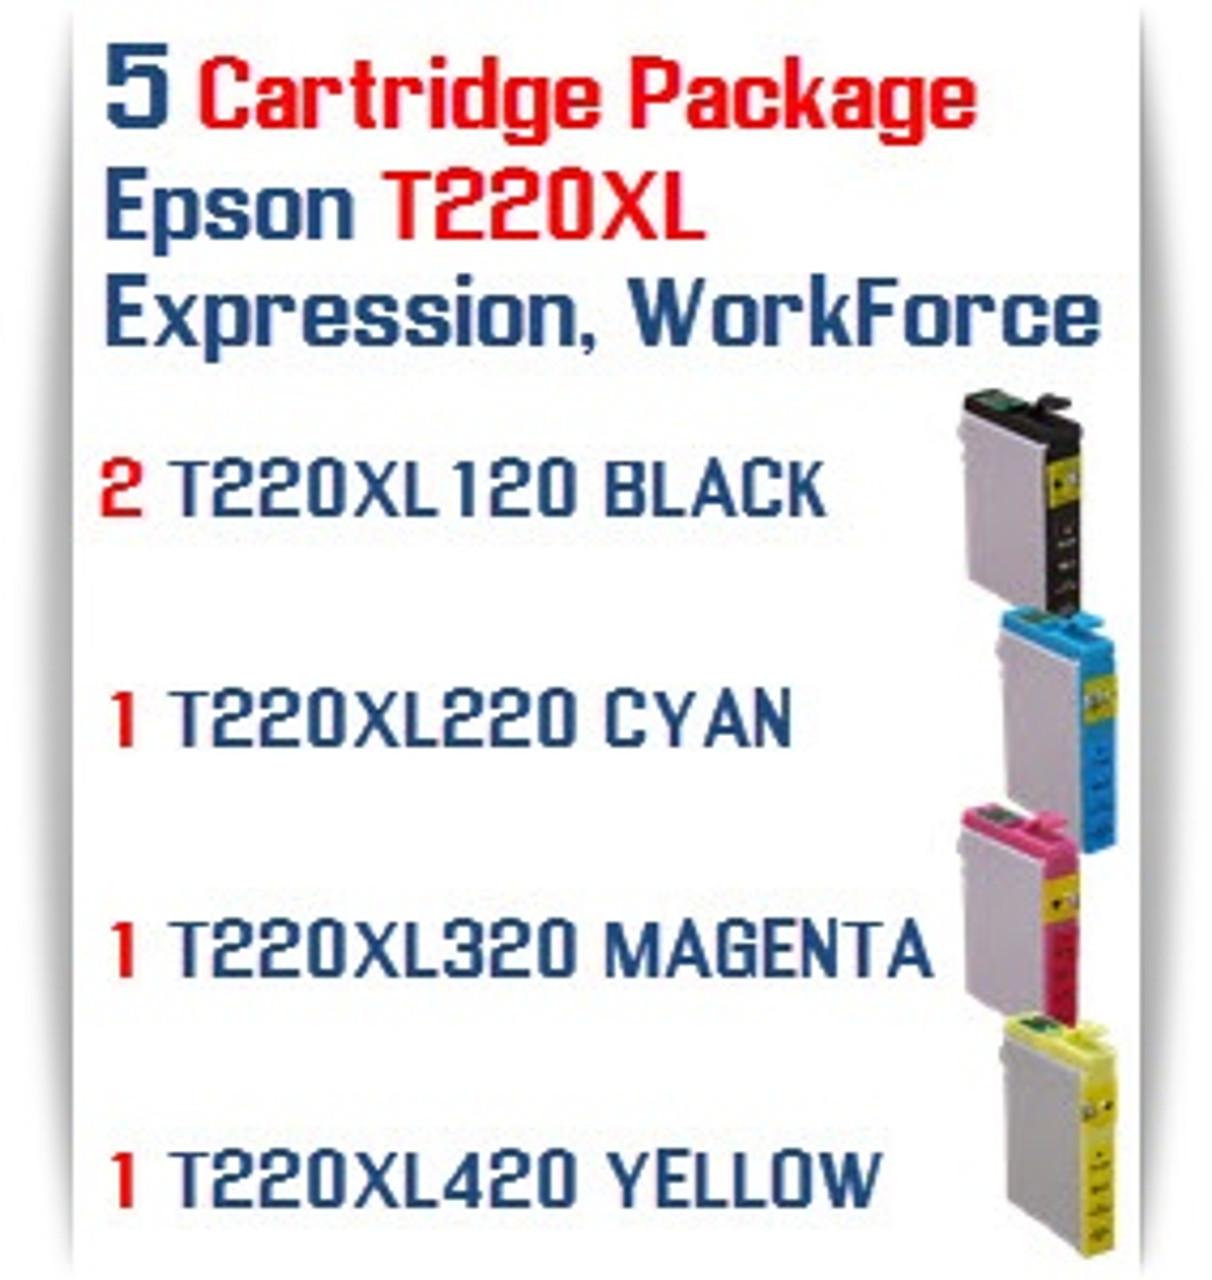 5 T220XL Cartridge Package  Epson Expression XP, WorkForce WF Compatible Ink Cartridges 2- T220XL120  Black, 1- T220XL220 Cyan, 1- T220XL320 Magenta, 1- T220XL420 Yellow